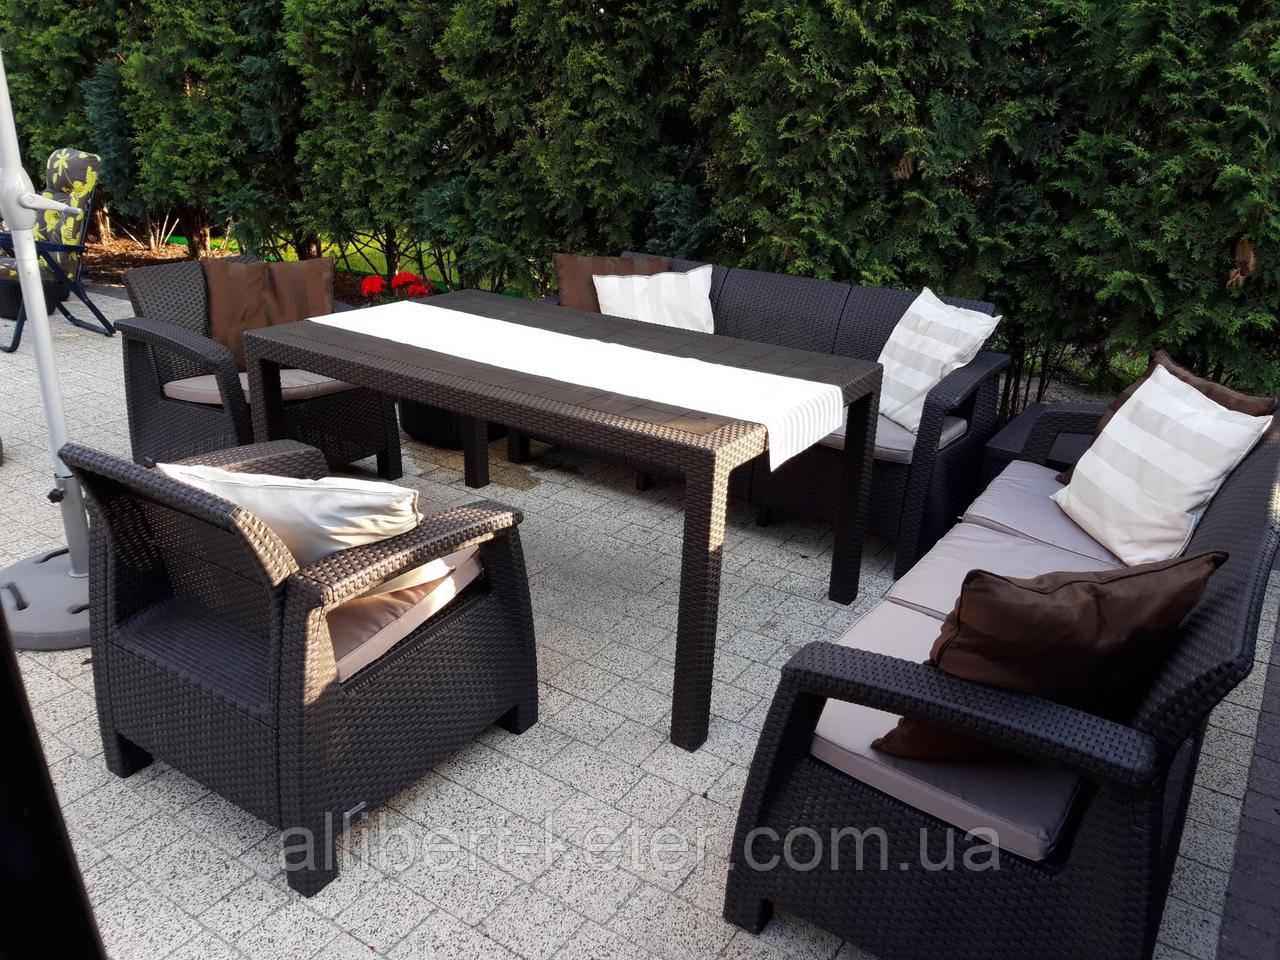 Комплект садових меблів Allibert by Keter Corfu Fiesta Max Lounge Set